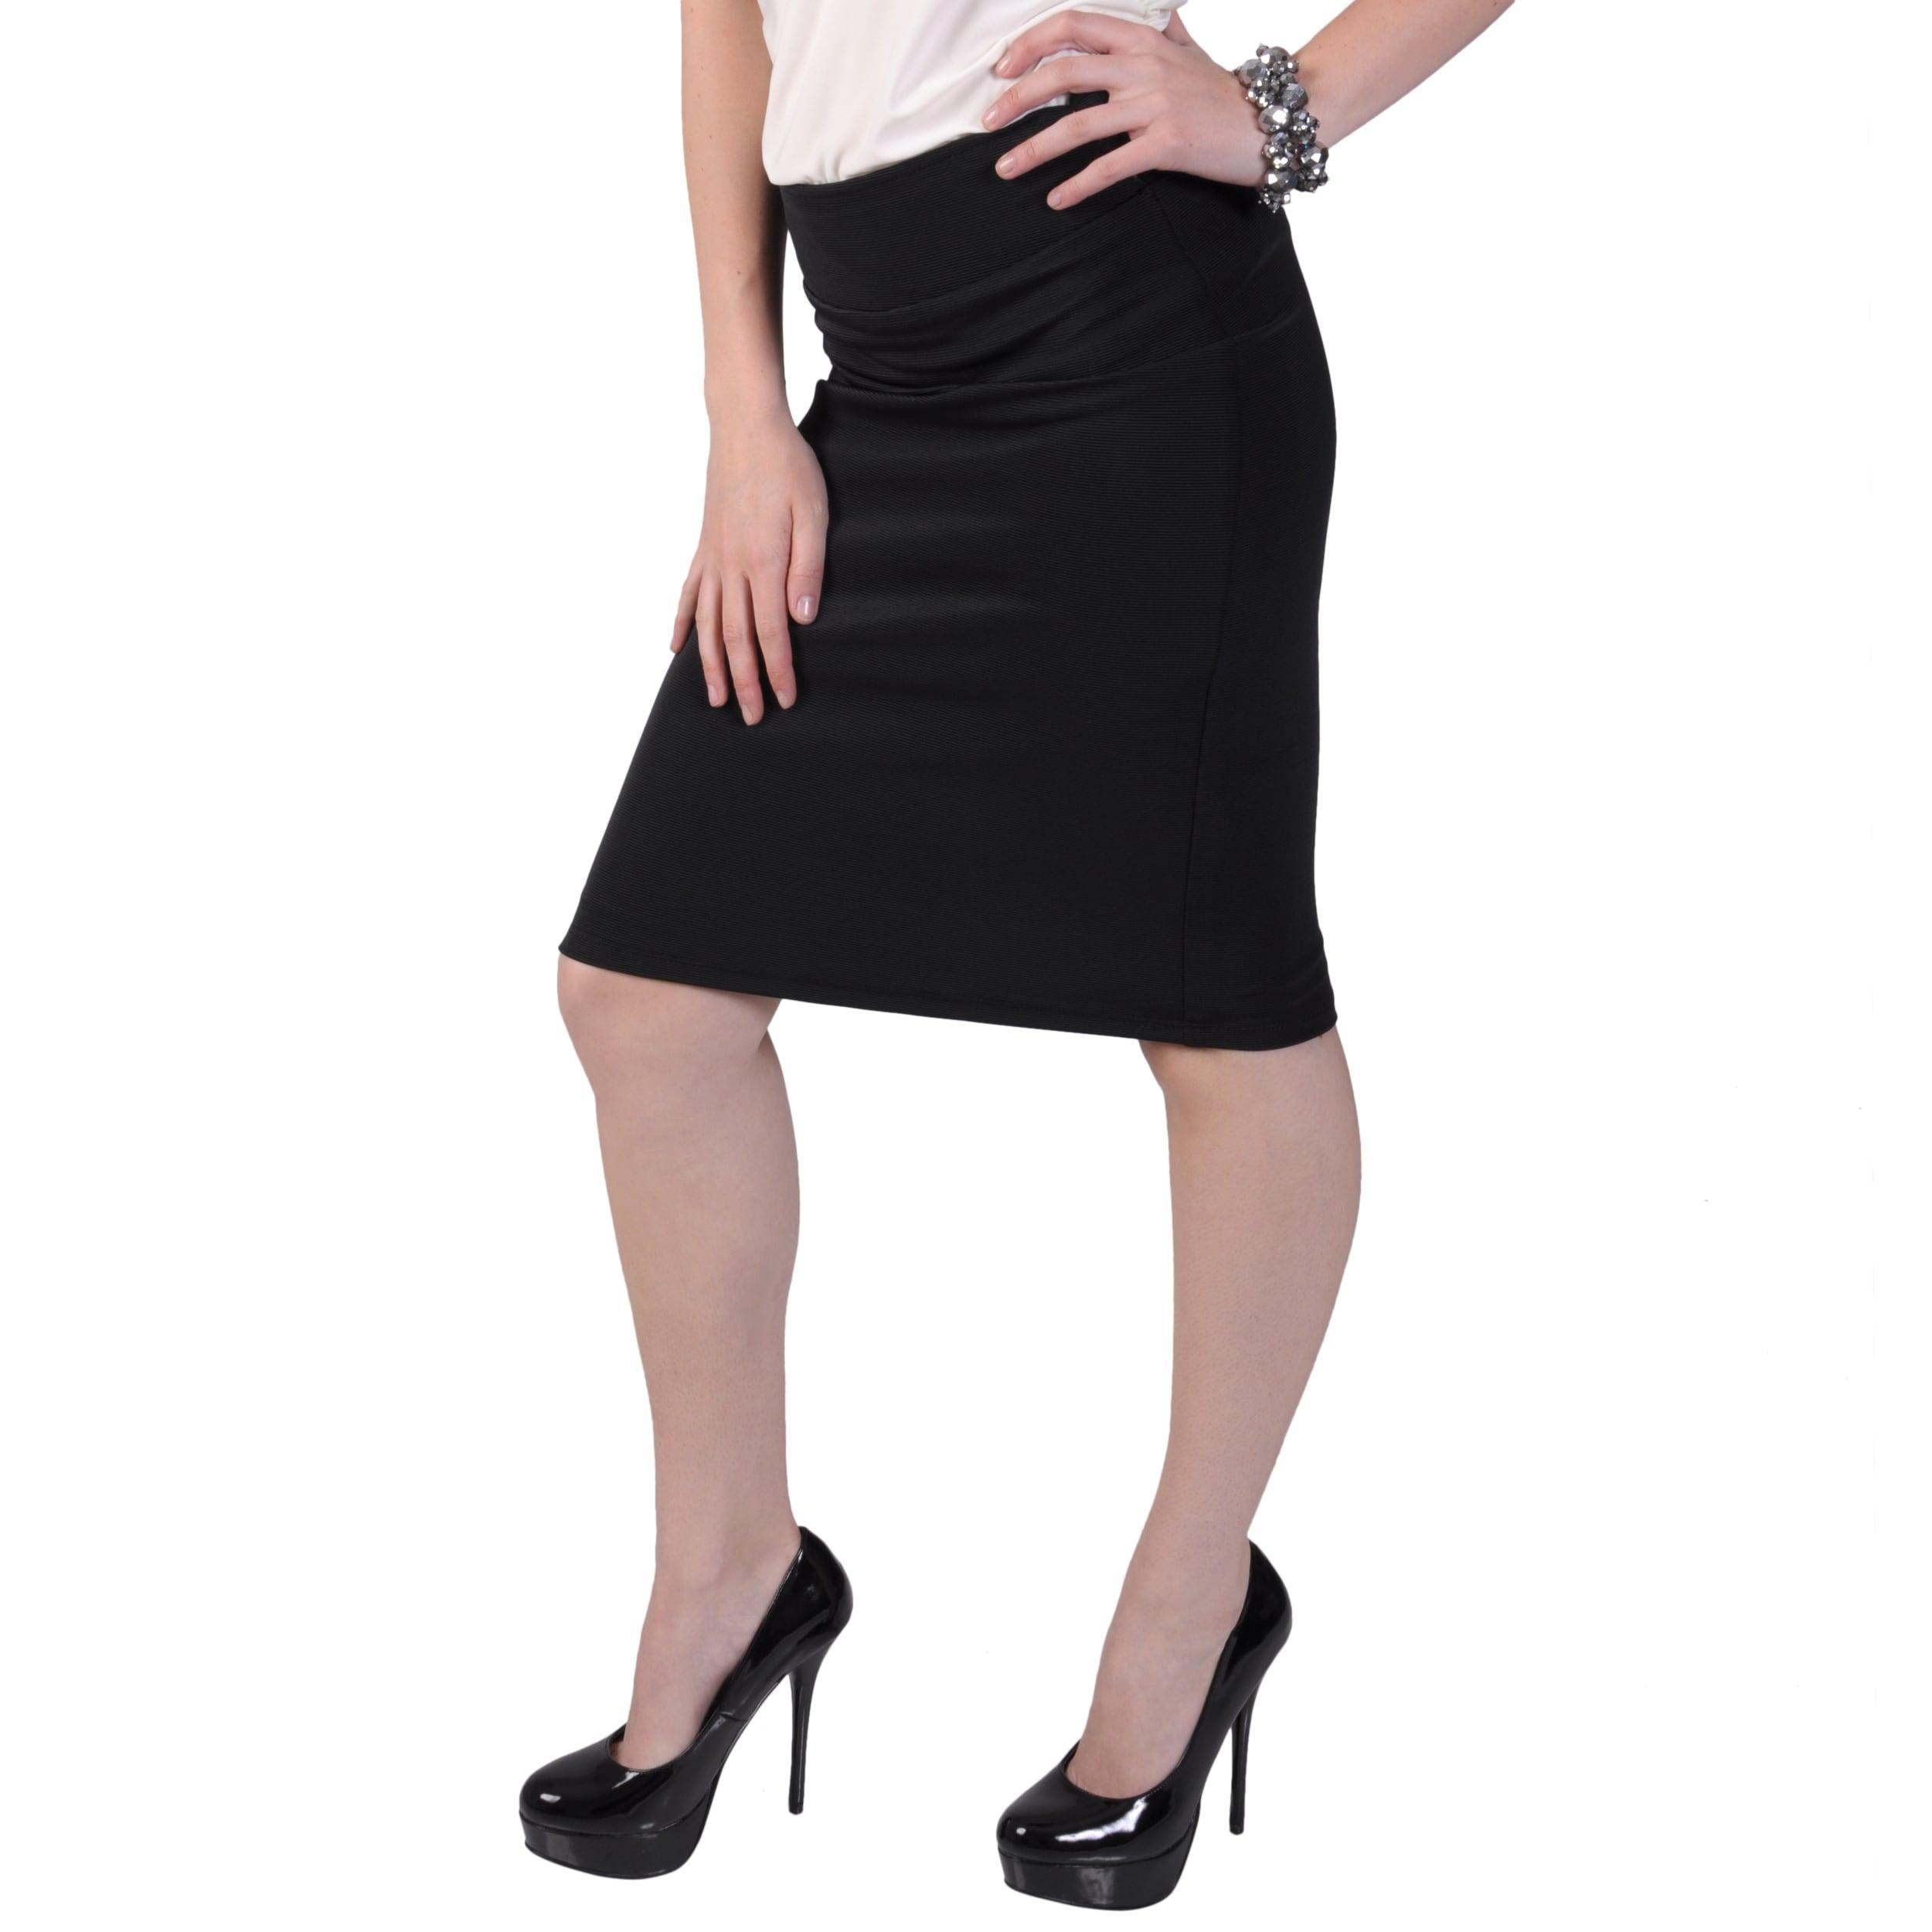 Tressa Designs Women's Stretchy Pinstriped Pencil Skirt